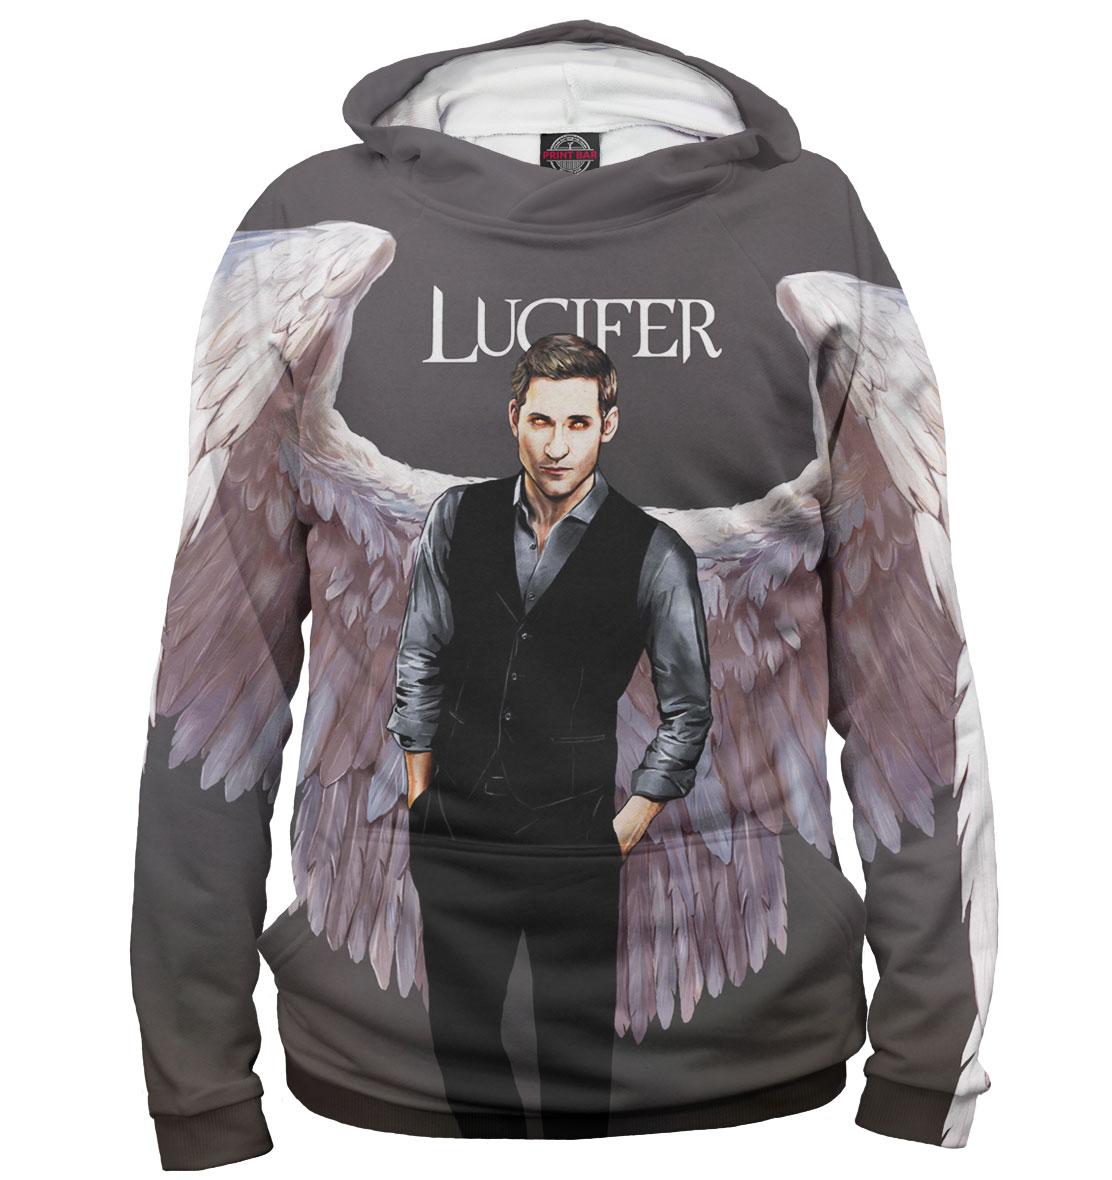 Купить Люцифер, Printbar, Худи, LCF-560487-hud-1